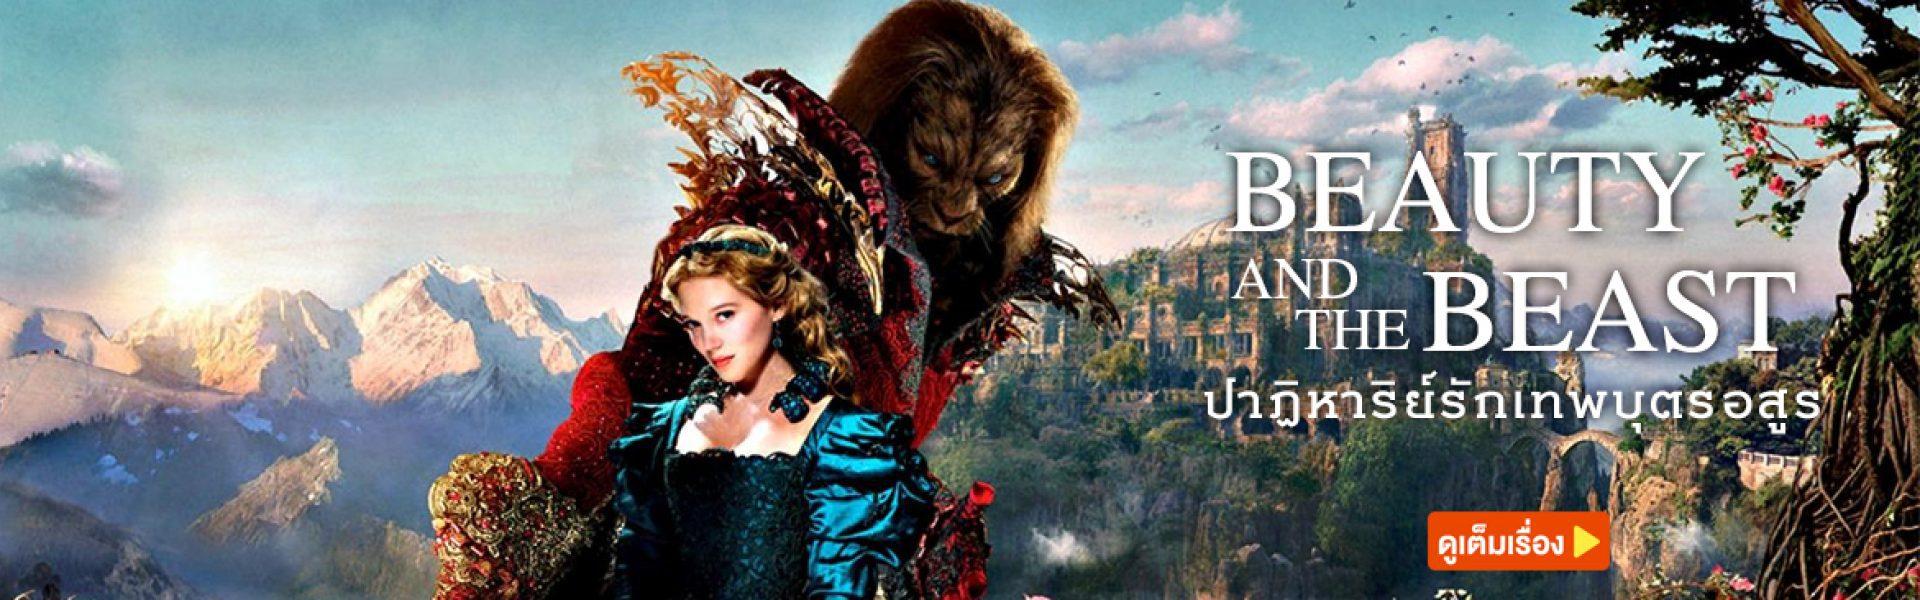 Beauty And The Beast ปาฏิหาริย์รักเทพบุตรอสูร (เต็มเรื่อง)